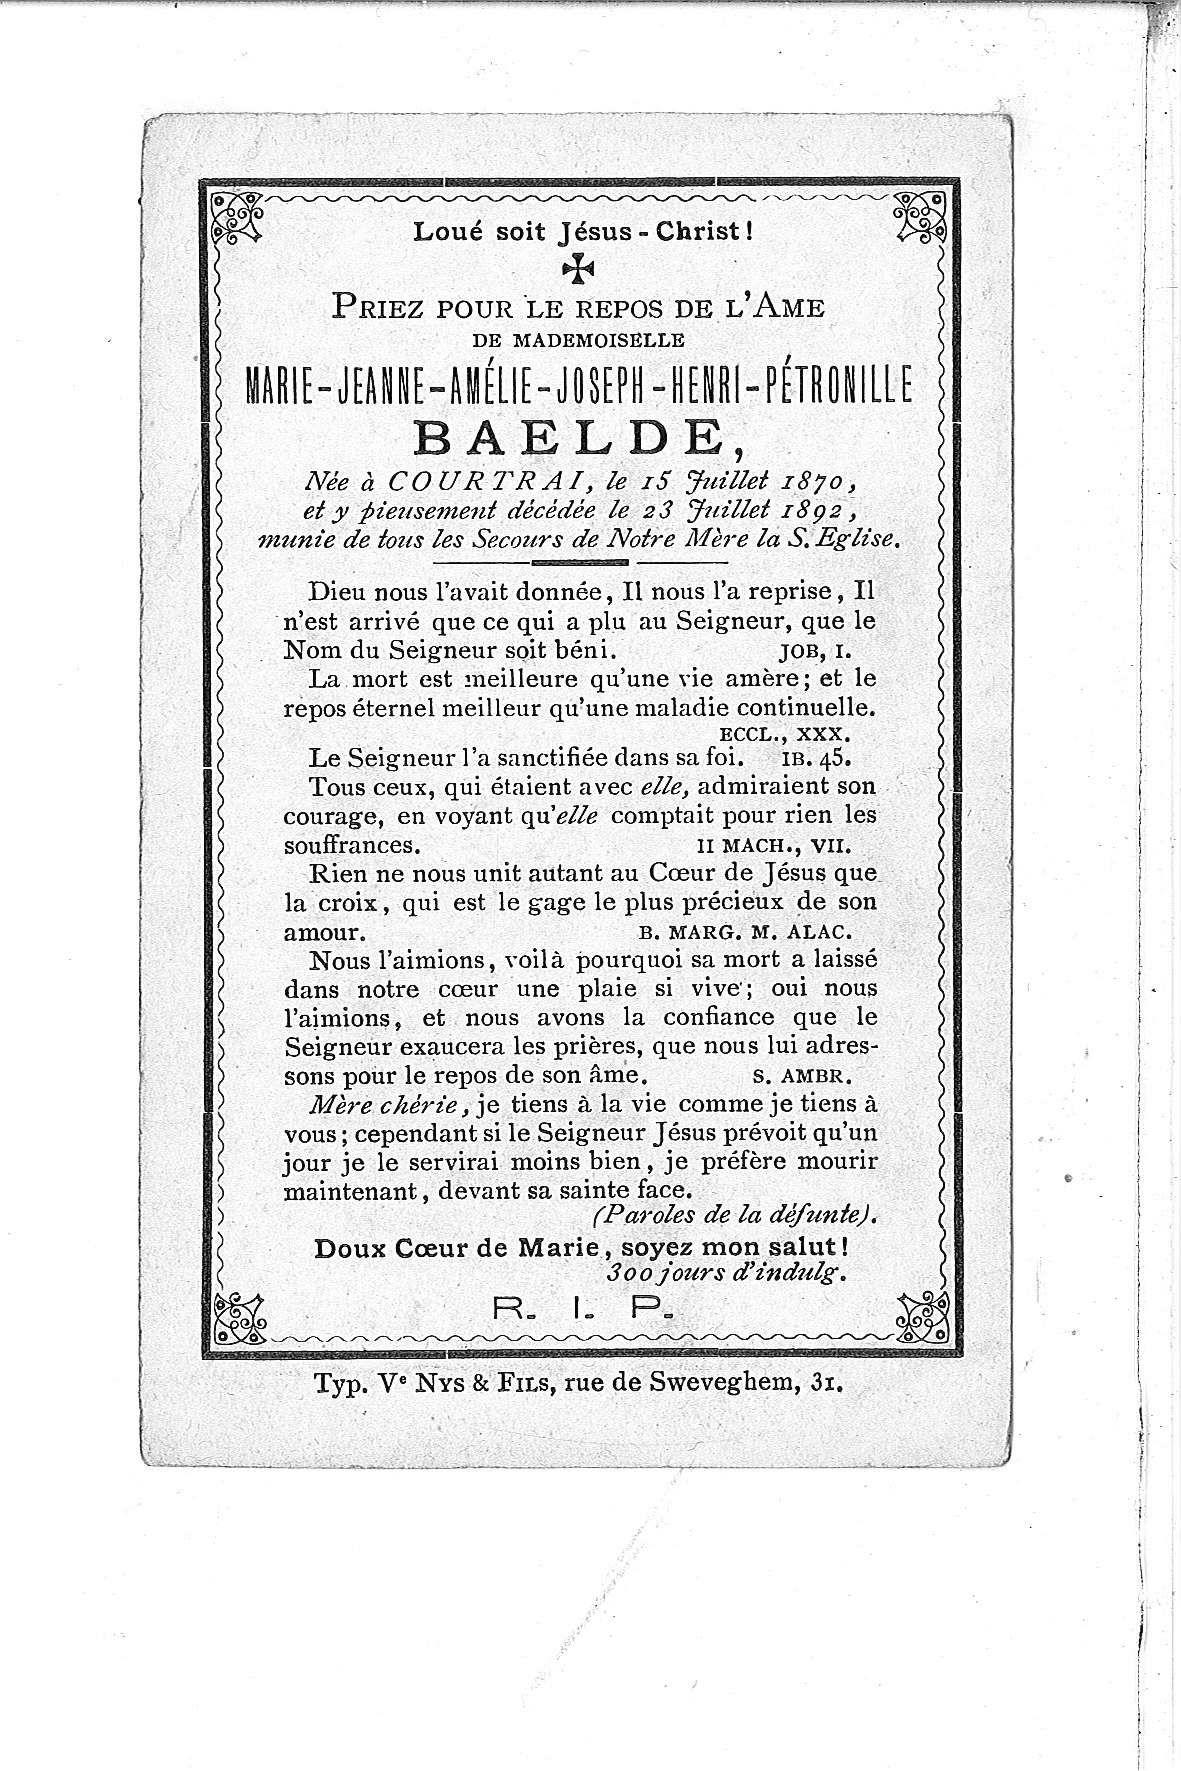 Marie-Jeanne-Amélie-Joseph-Henri-Pétronelle(1892)20100928121633_00003.jpg